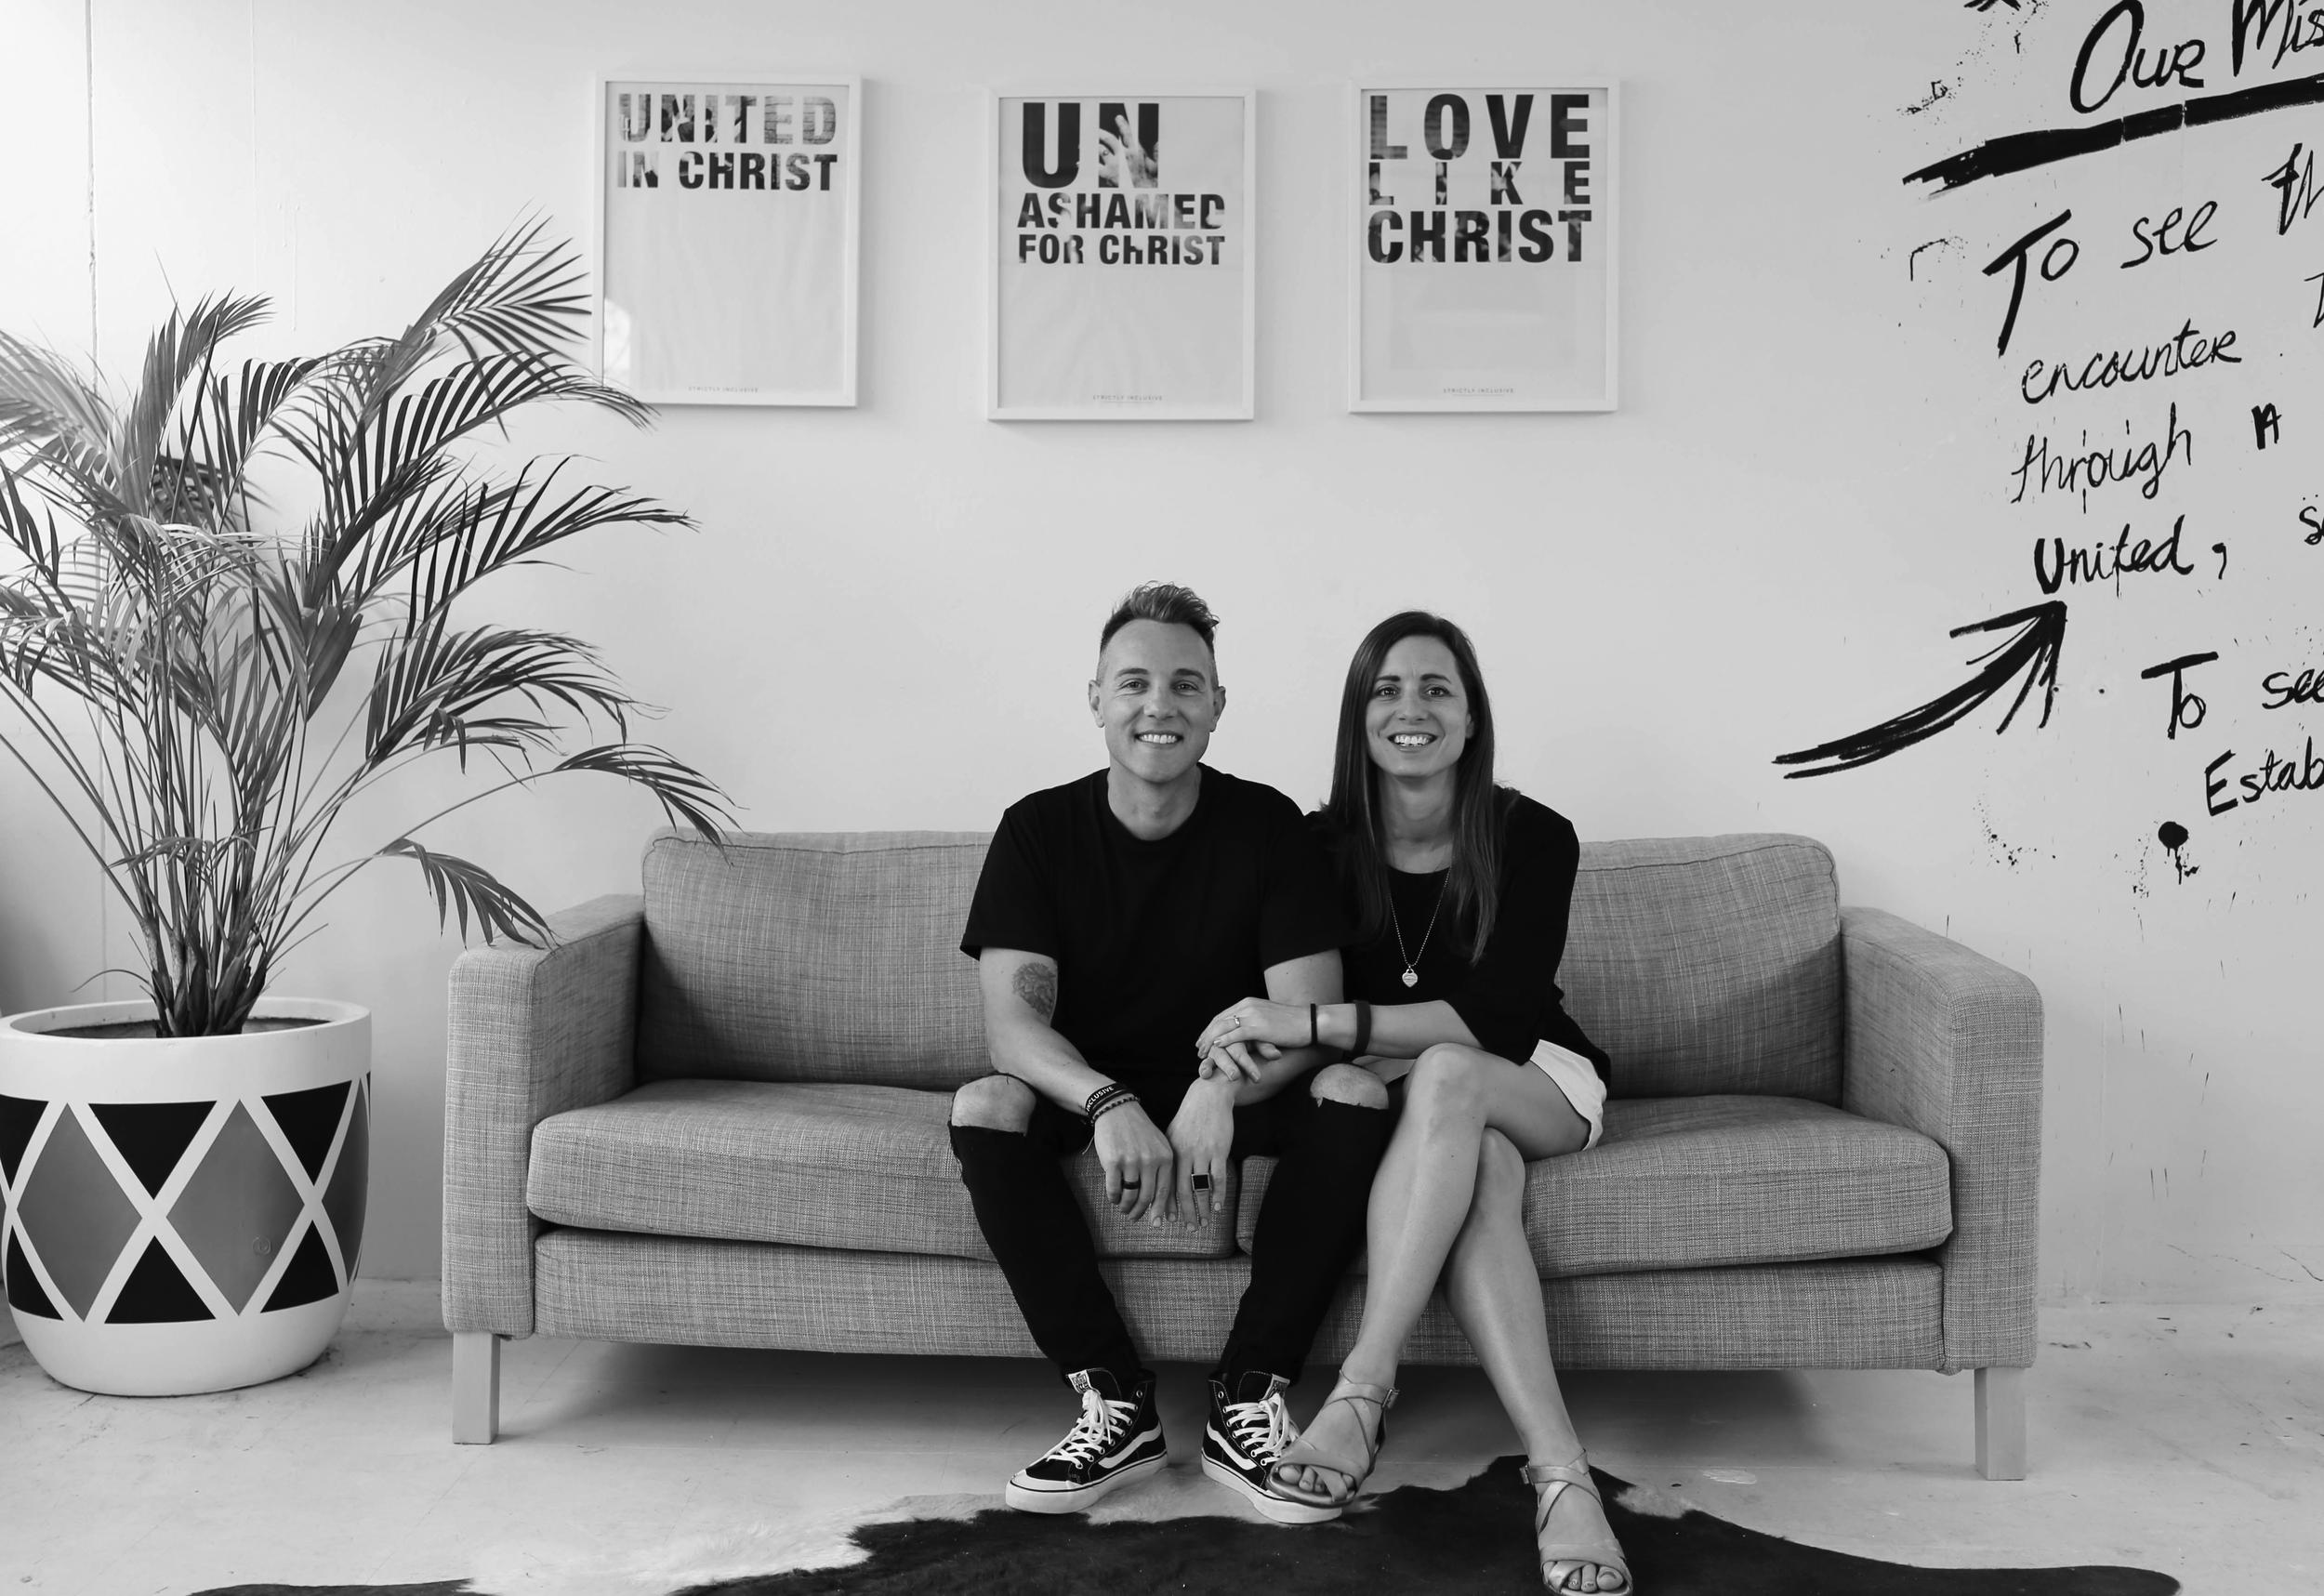 - Lead Pastors   James & Alanna Murray